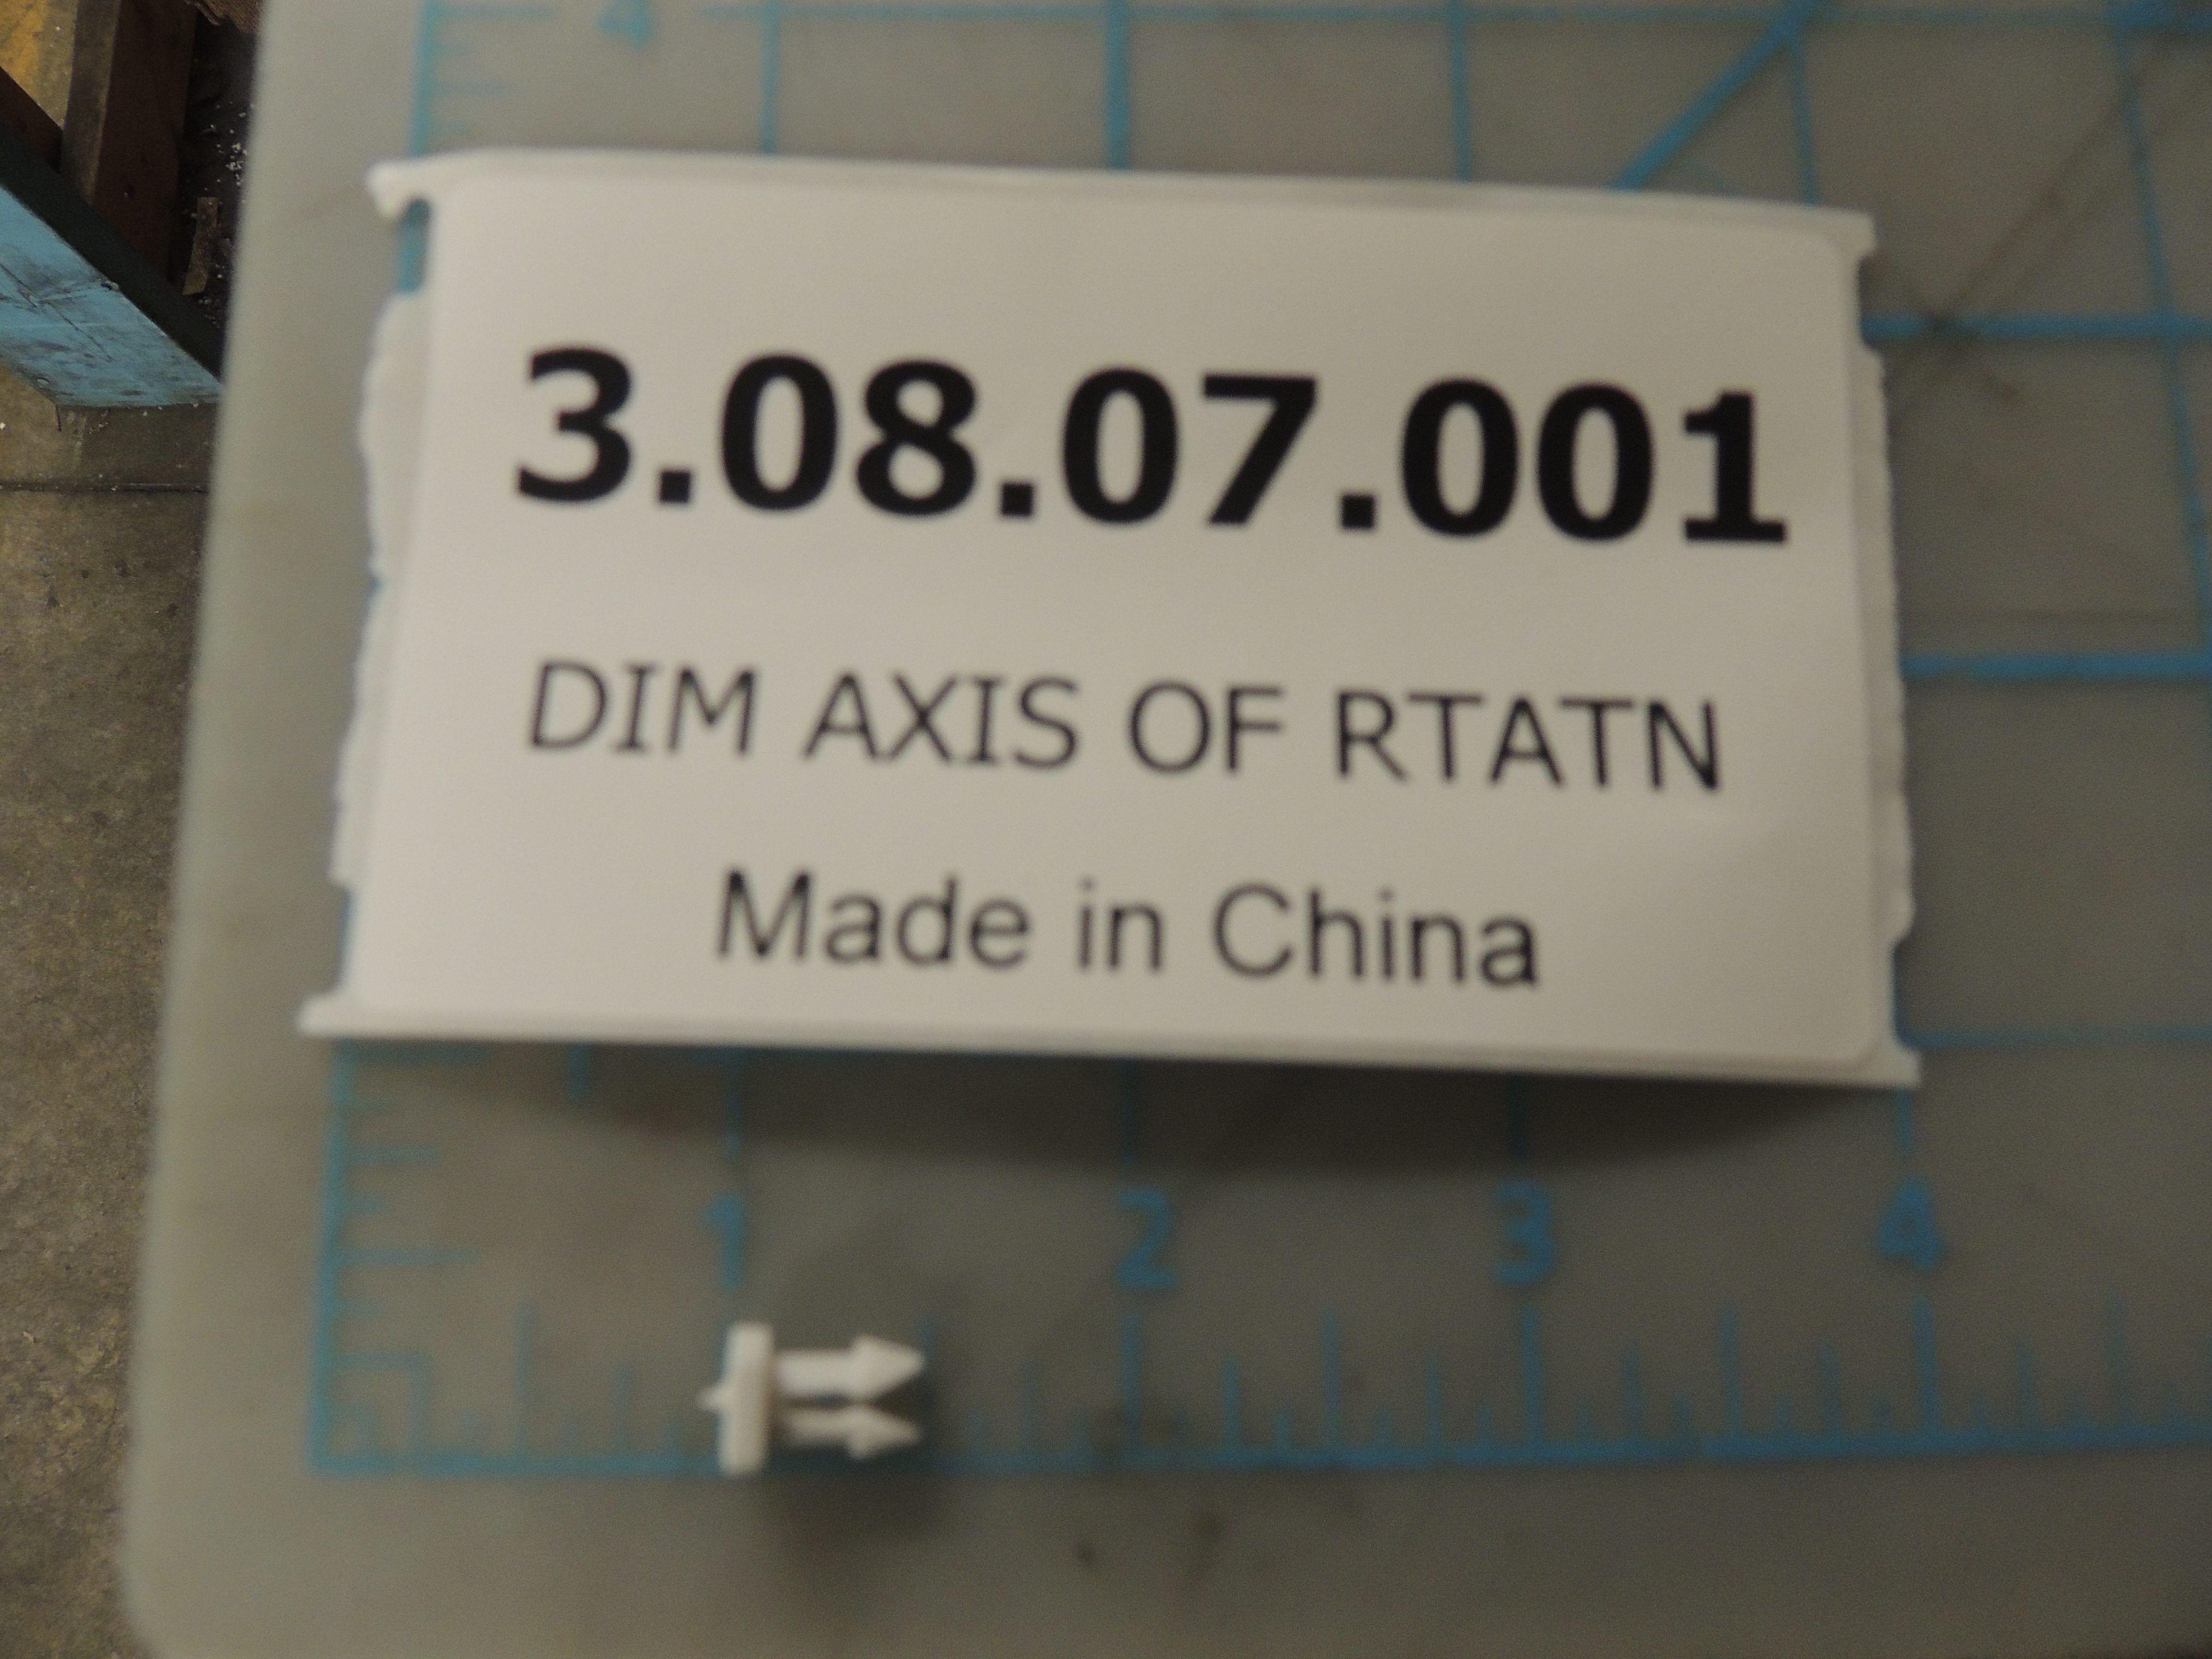 DIM AXIS OF RTATN